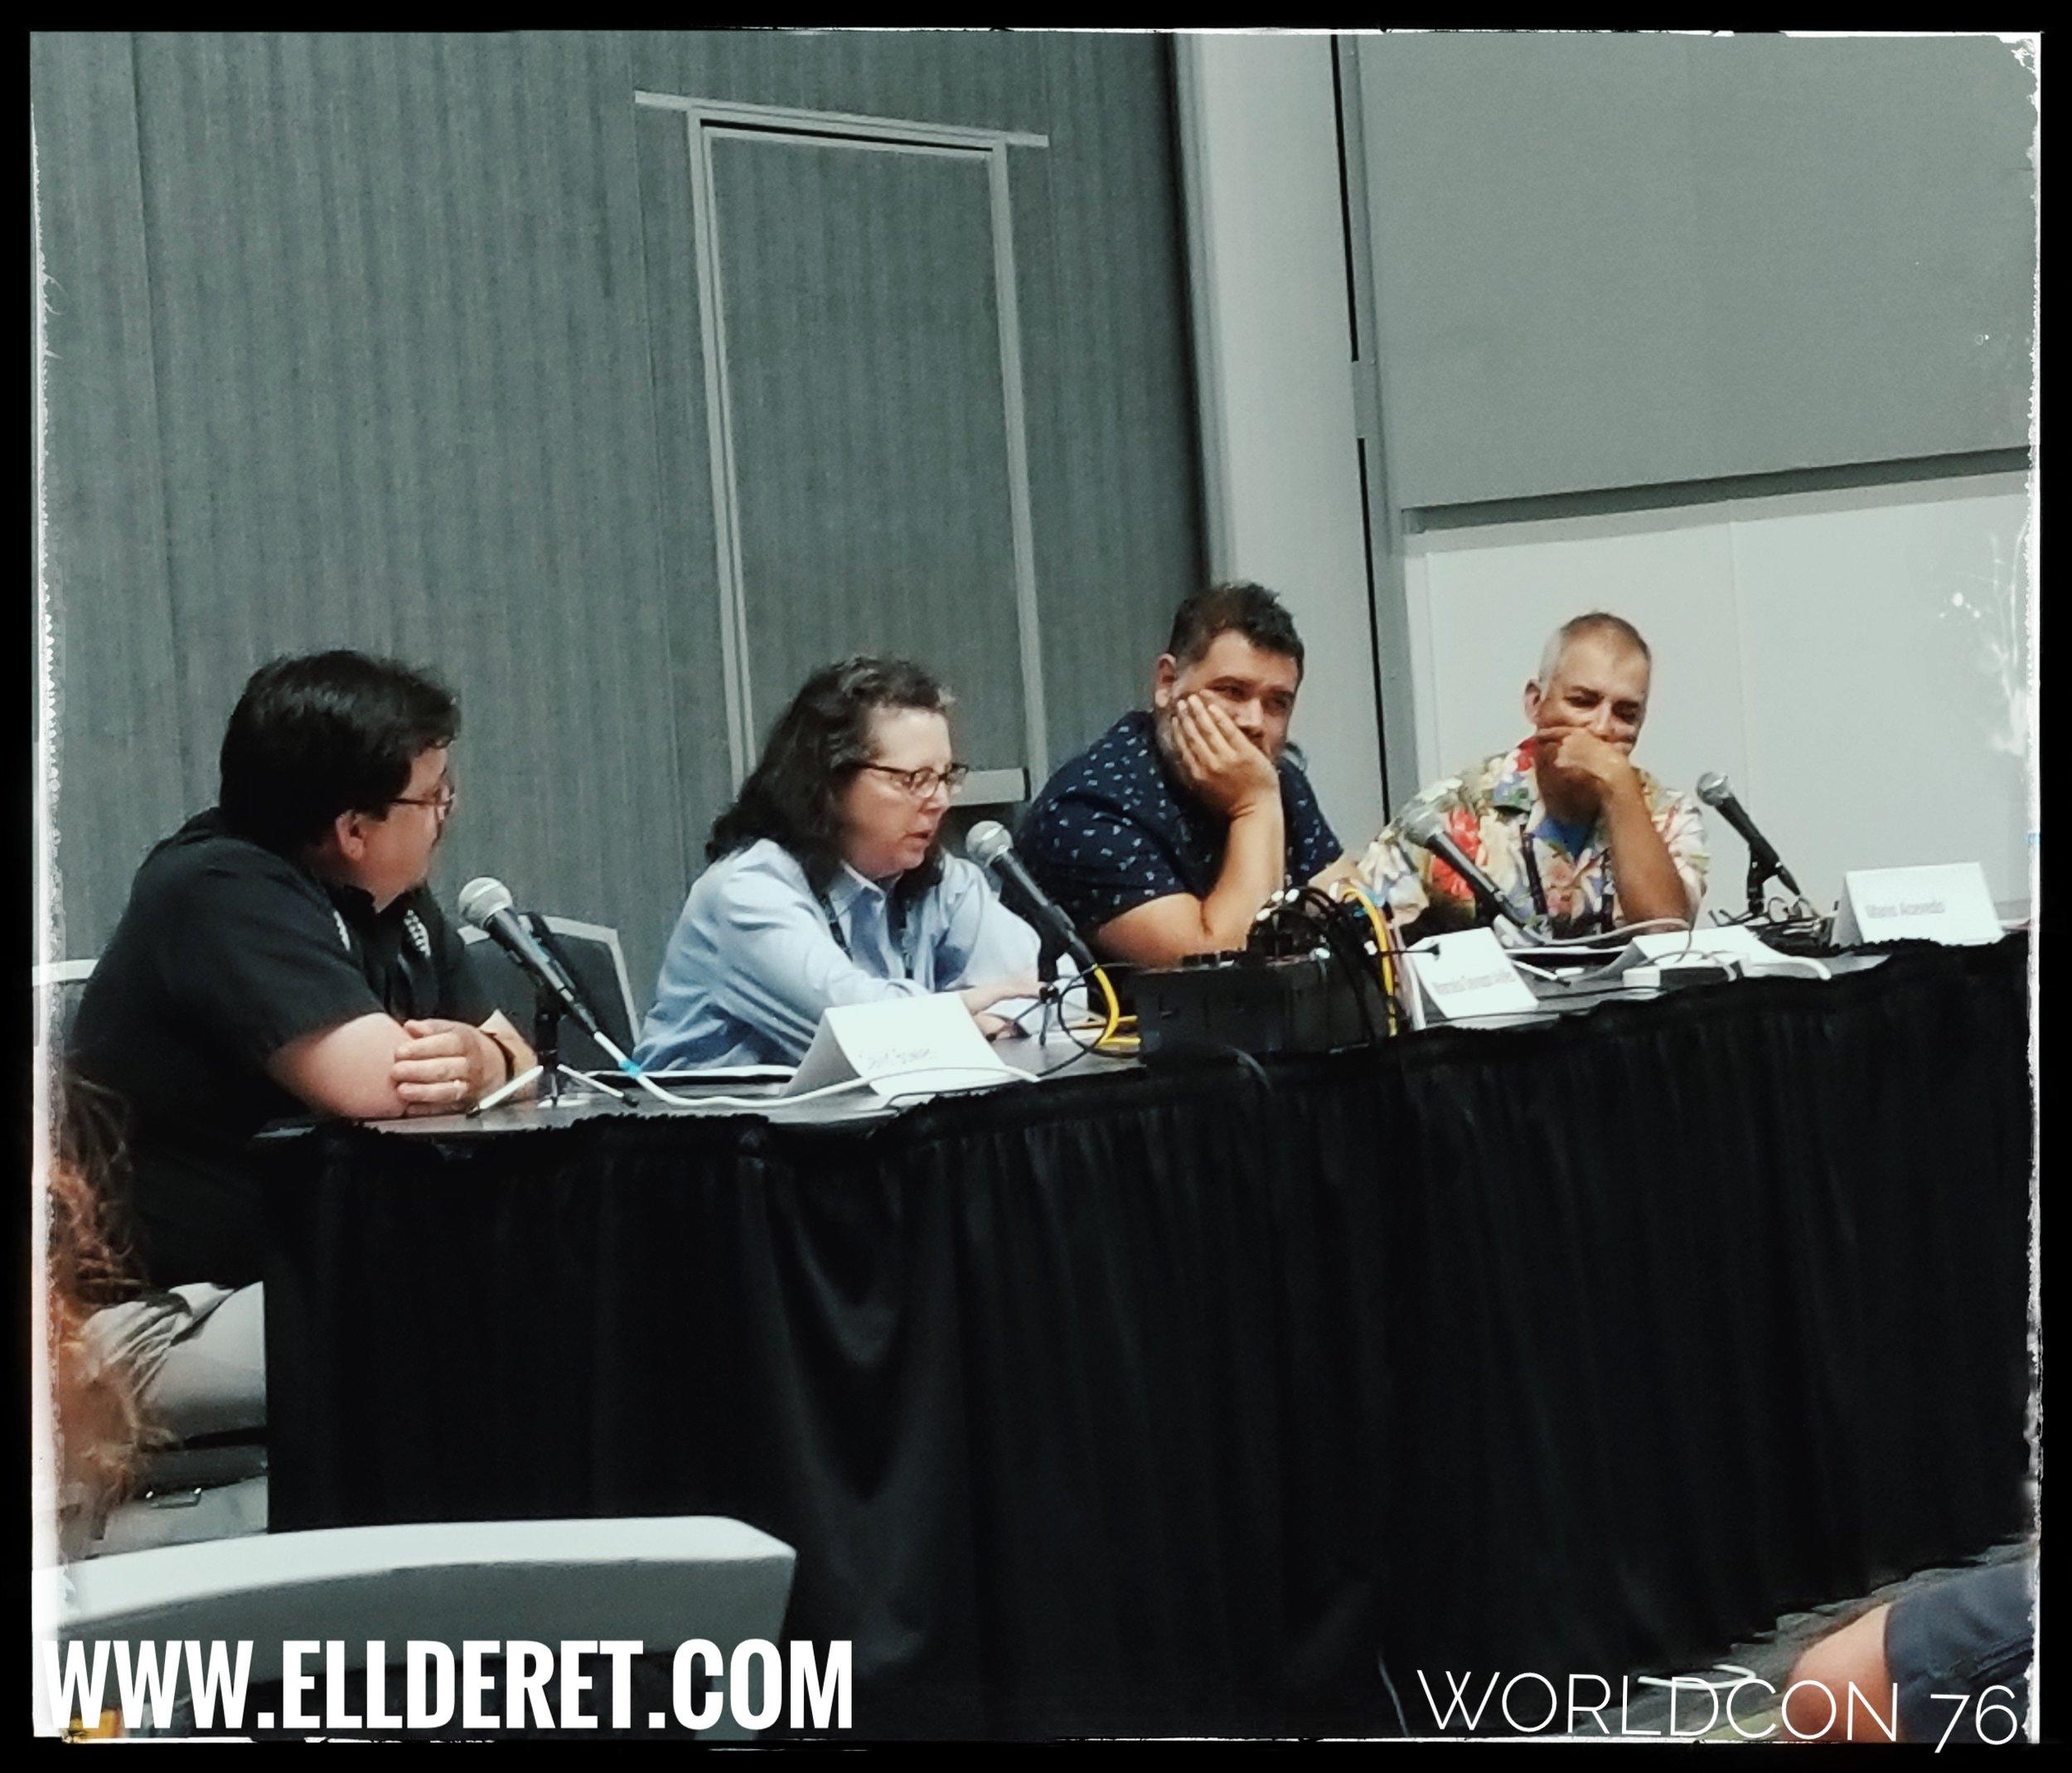 em-markoff-mexicanx-initiative-3-worldcon-76.jpeg